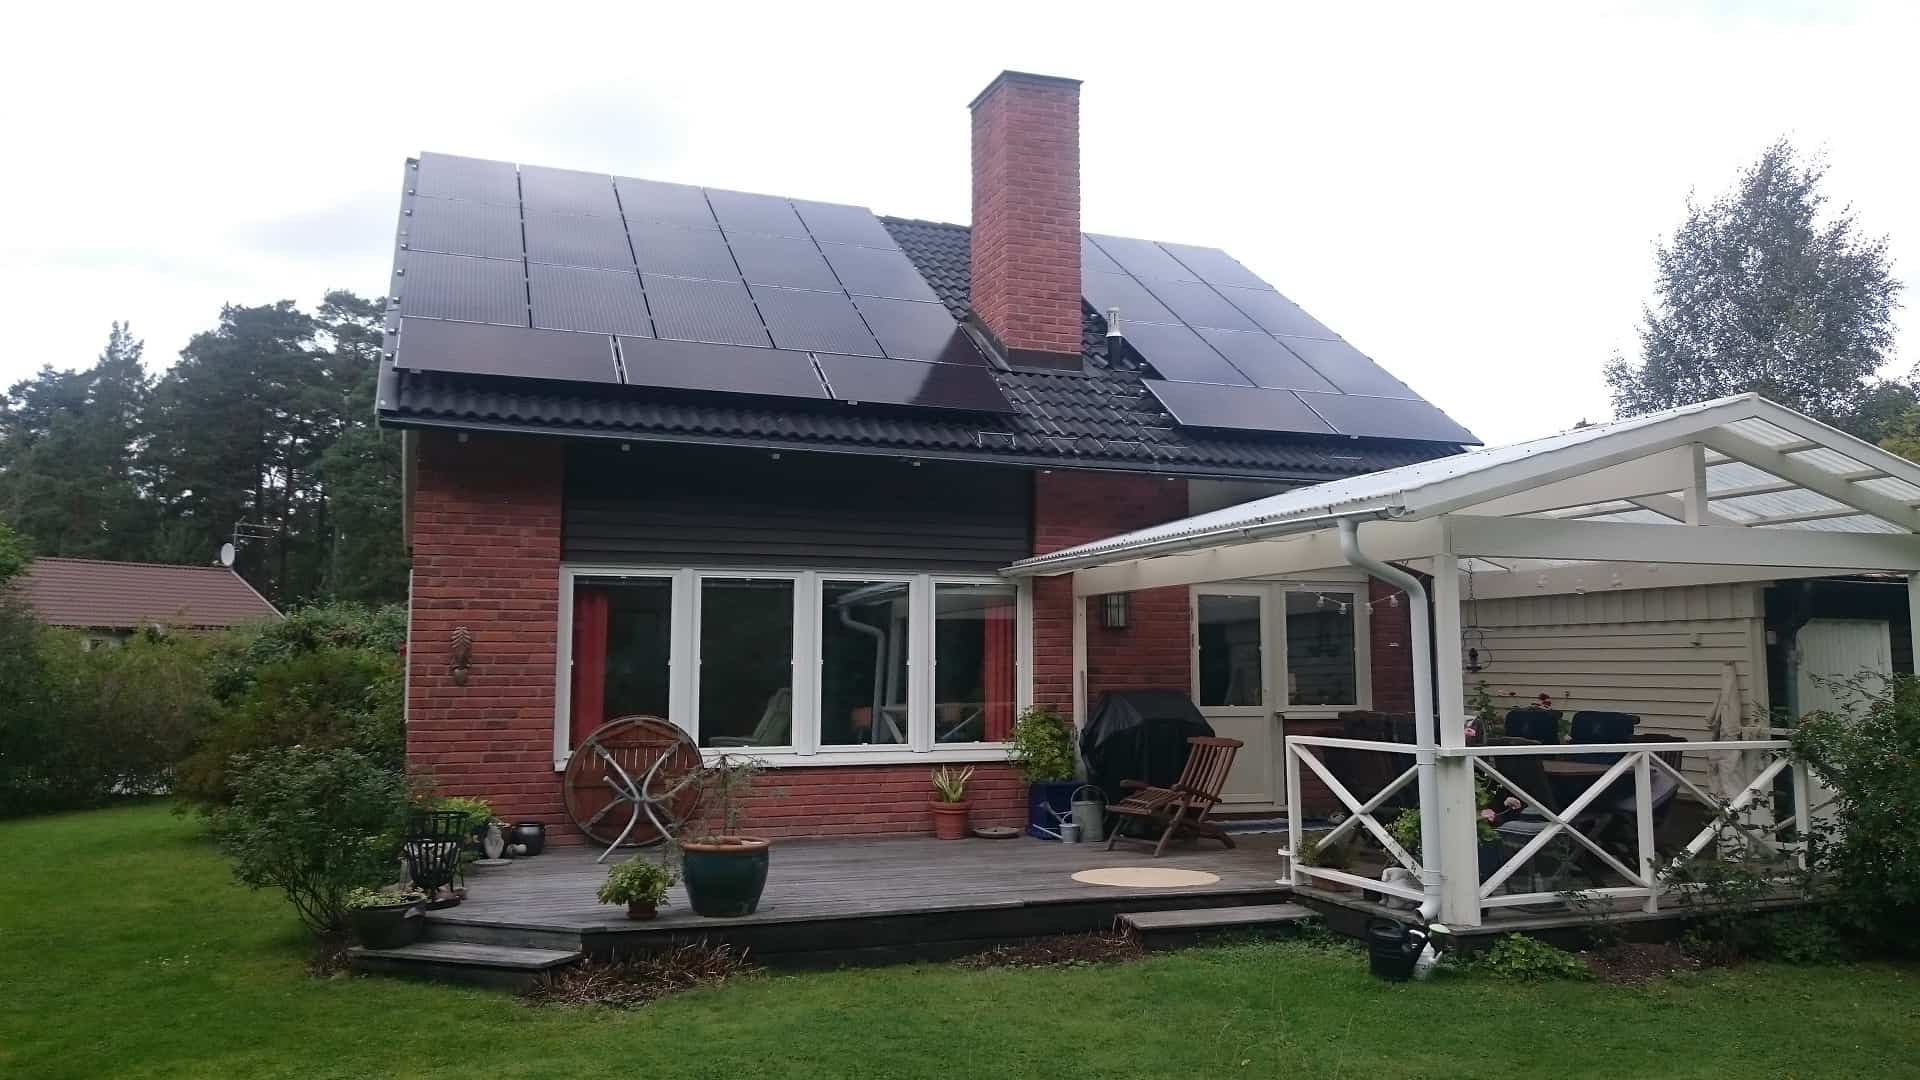 Hartrajet 14 - 29 solpaneler, ca 7500 kWh/år